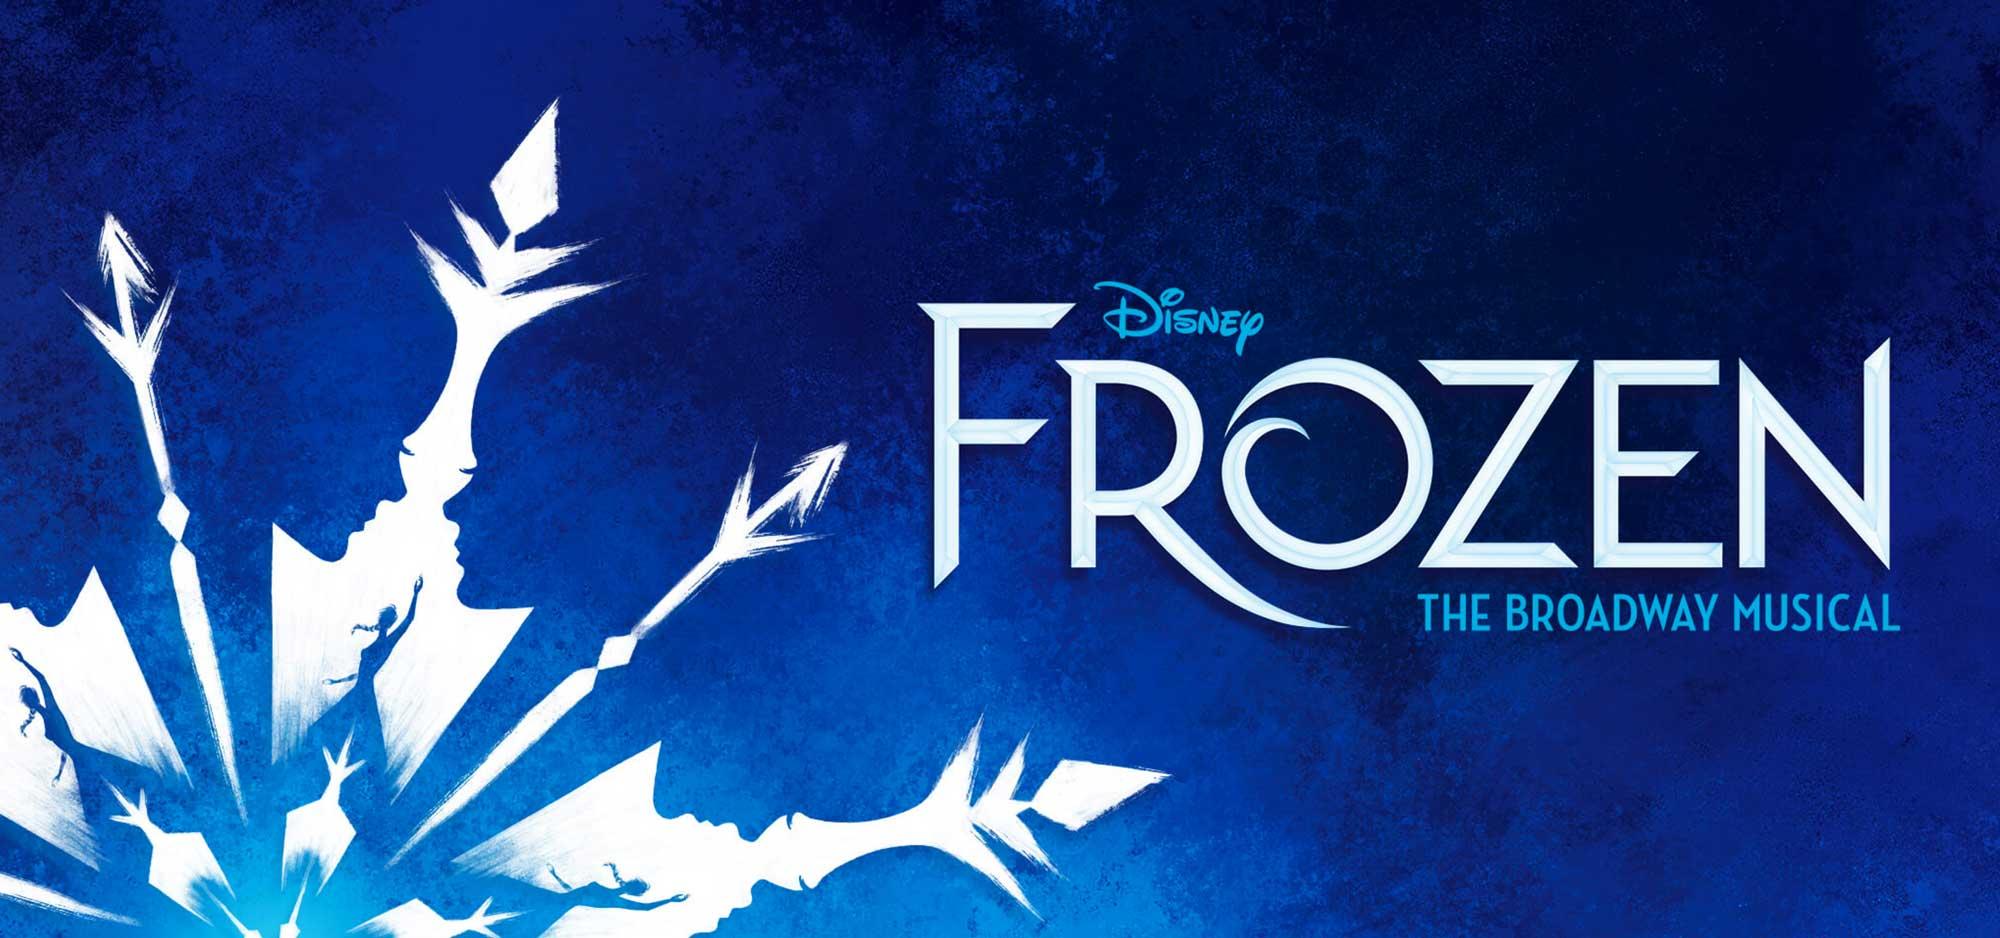 Frozen-The-Musical-New-Poster.jpg